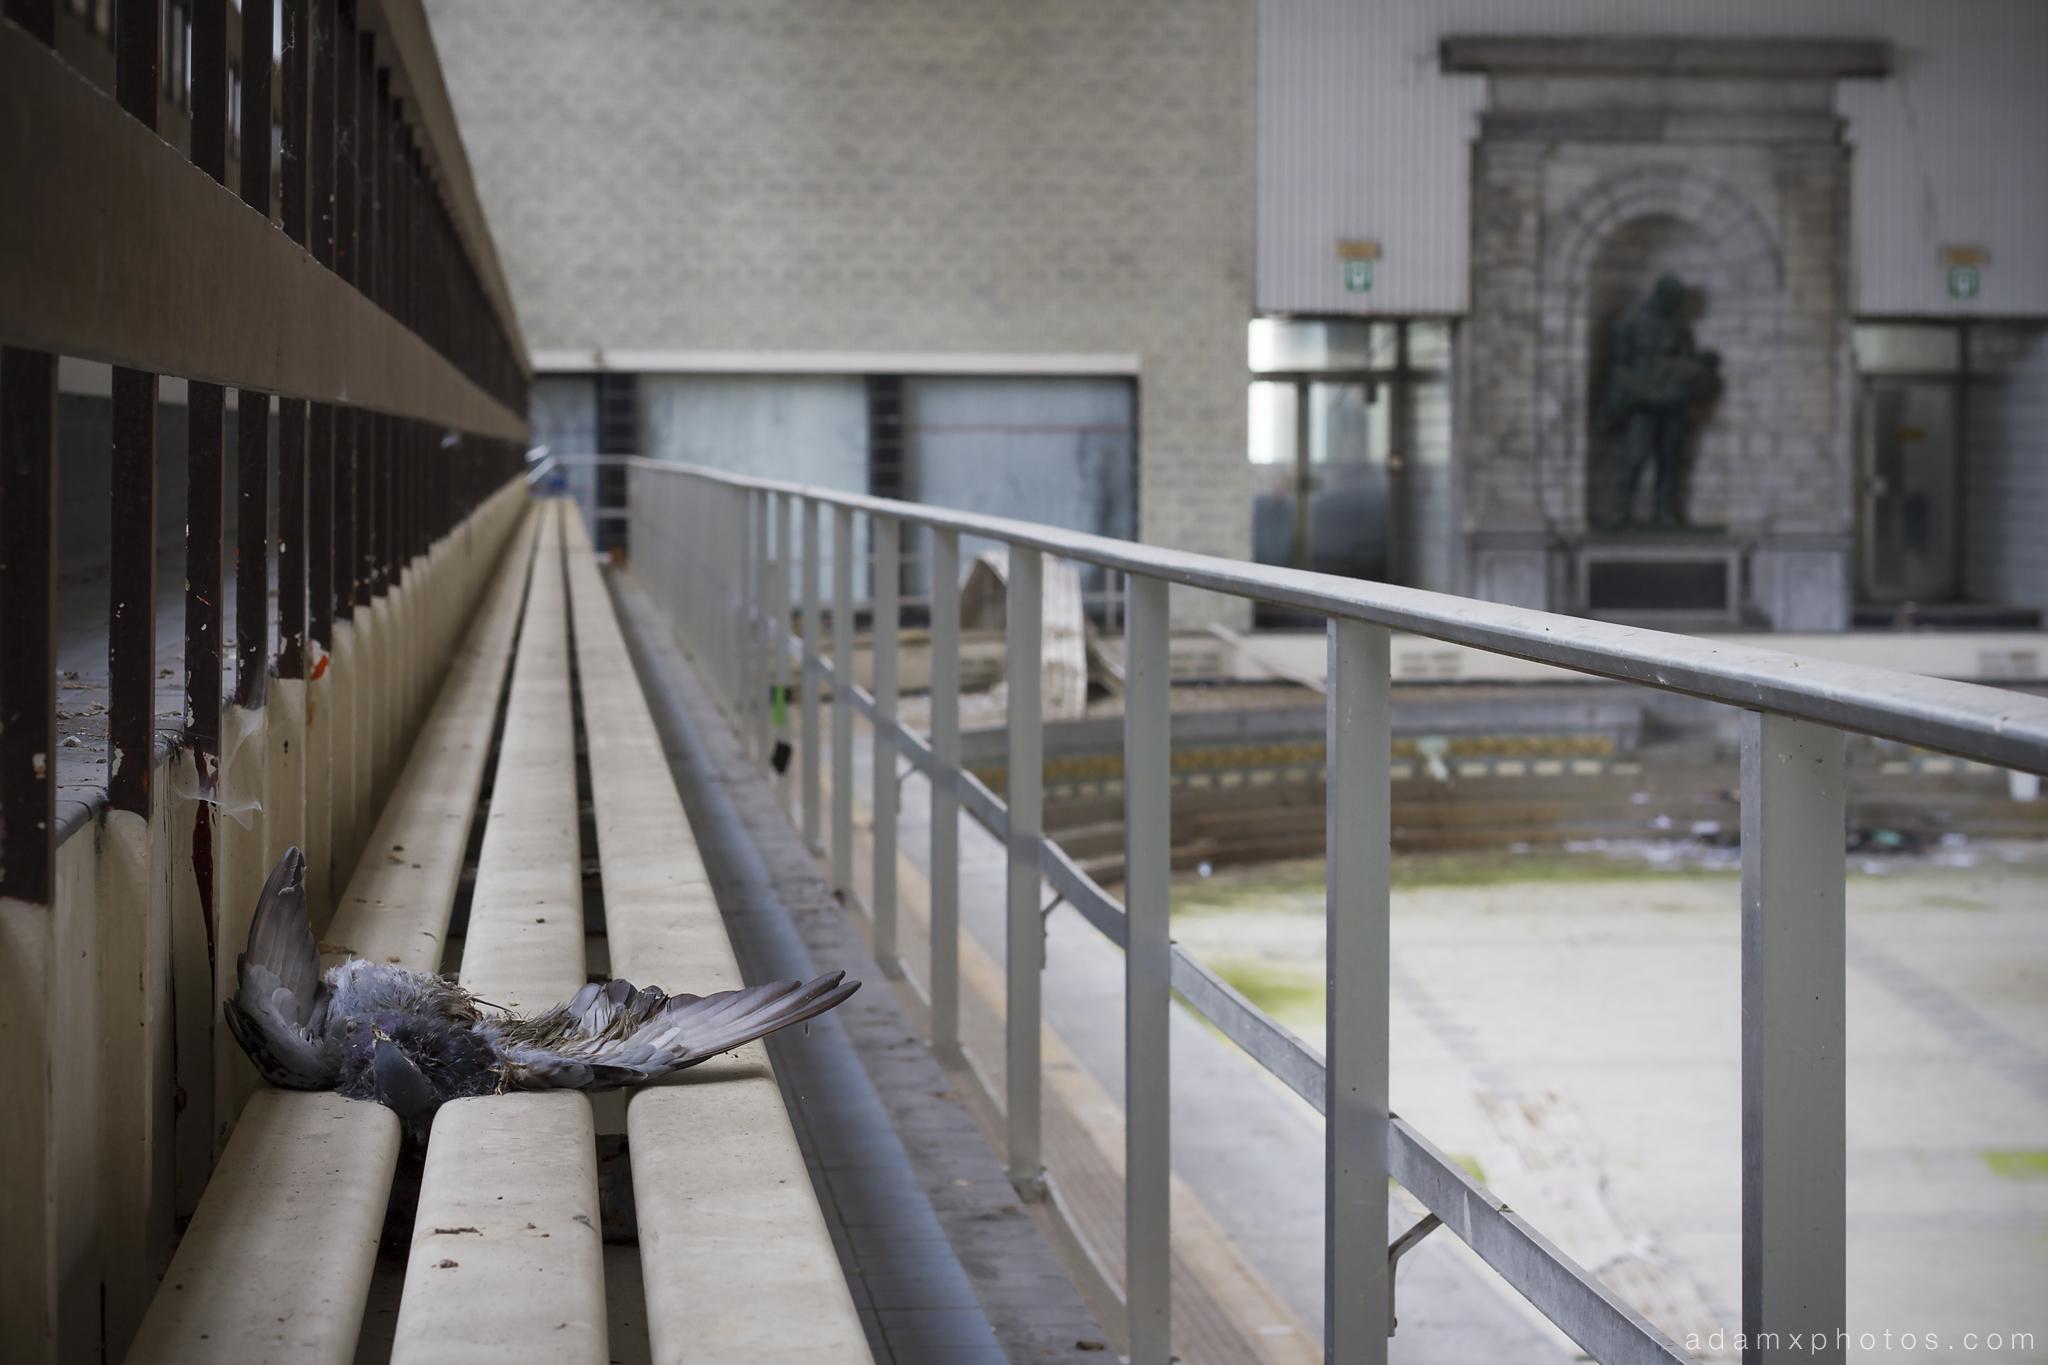 Explore 102 piscine crachoir belgium september 2014 for Brussels piscine